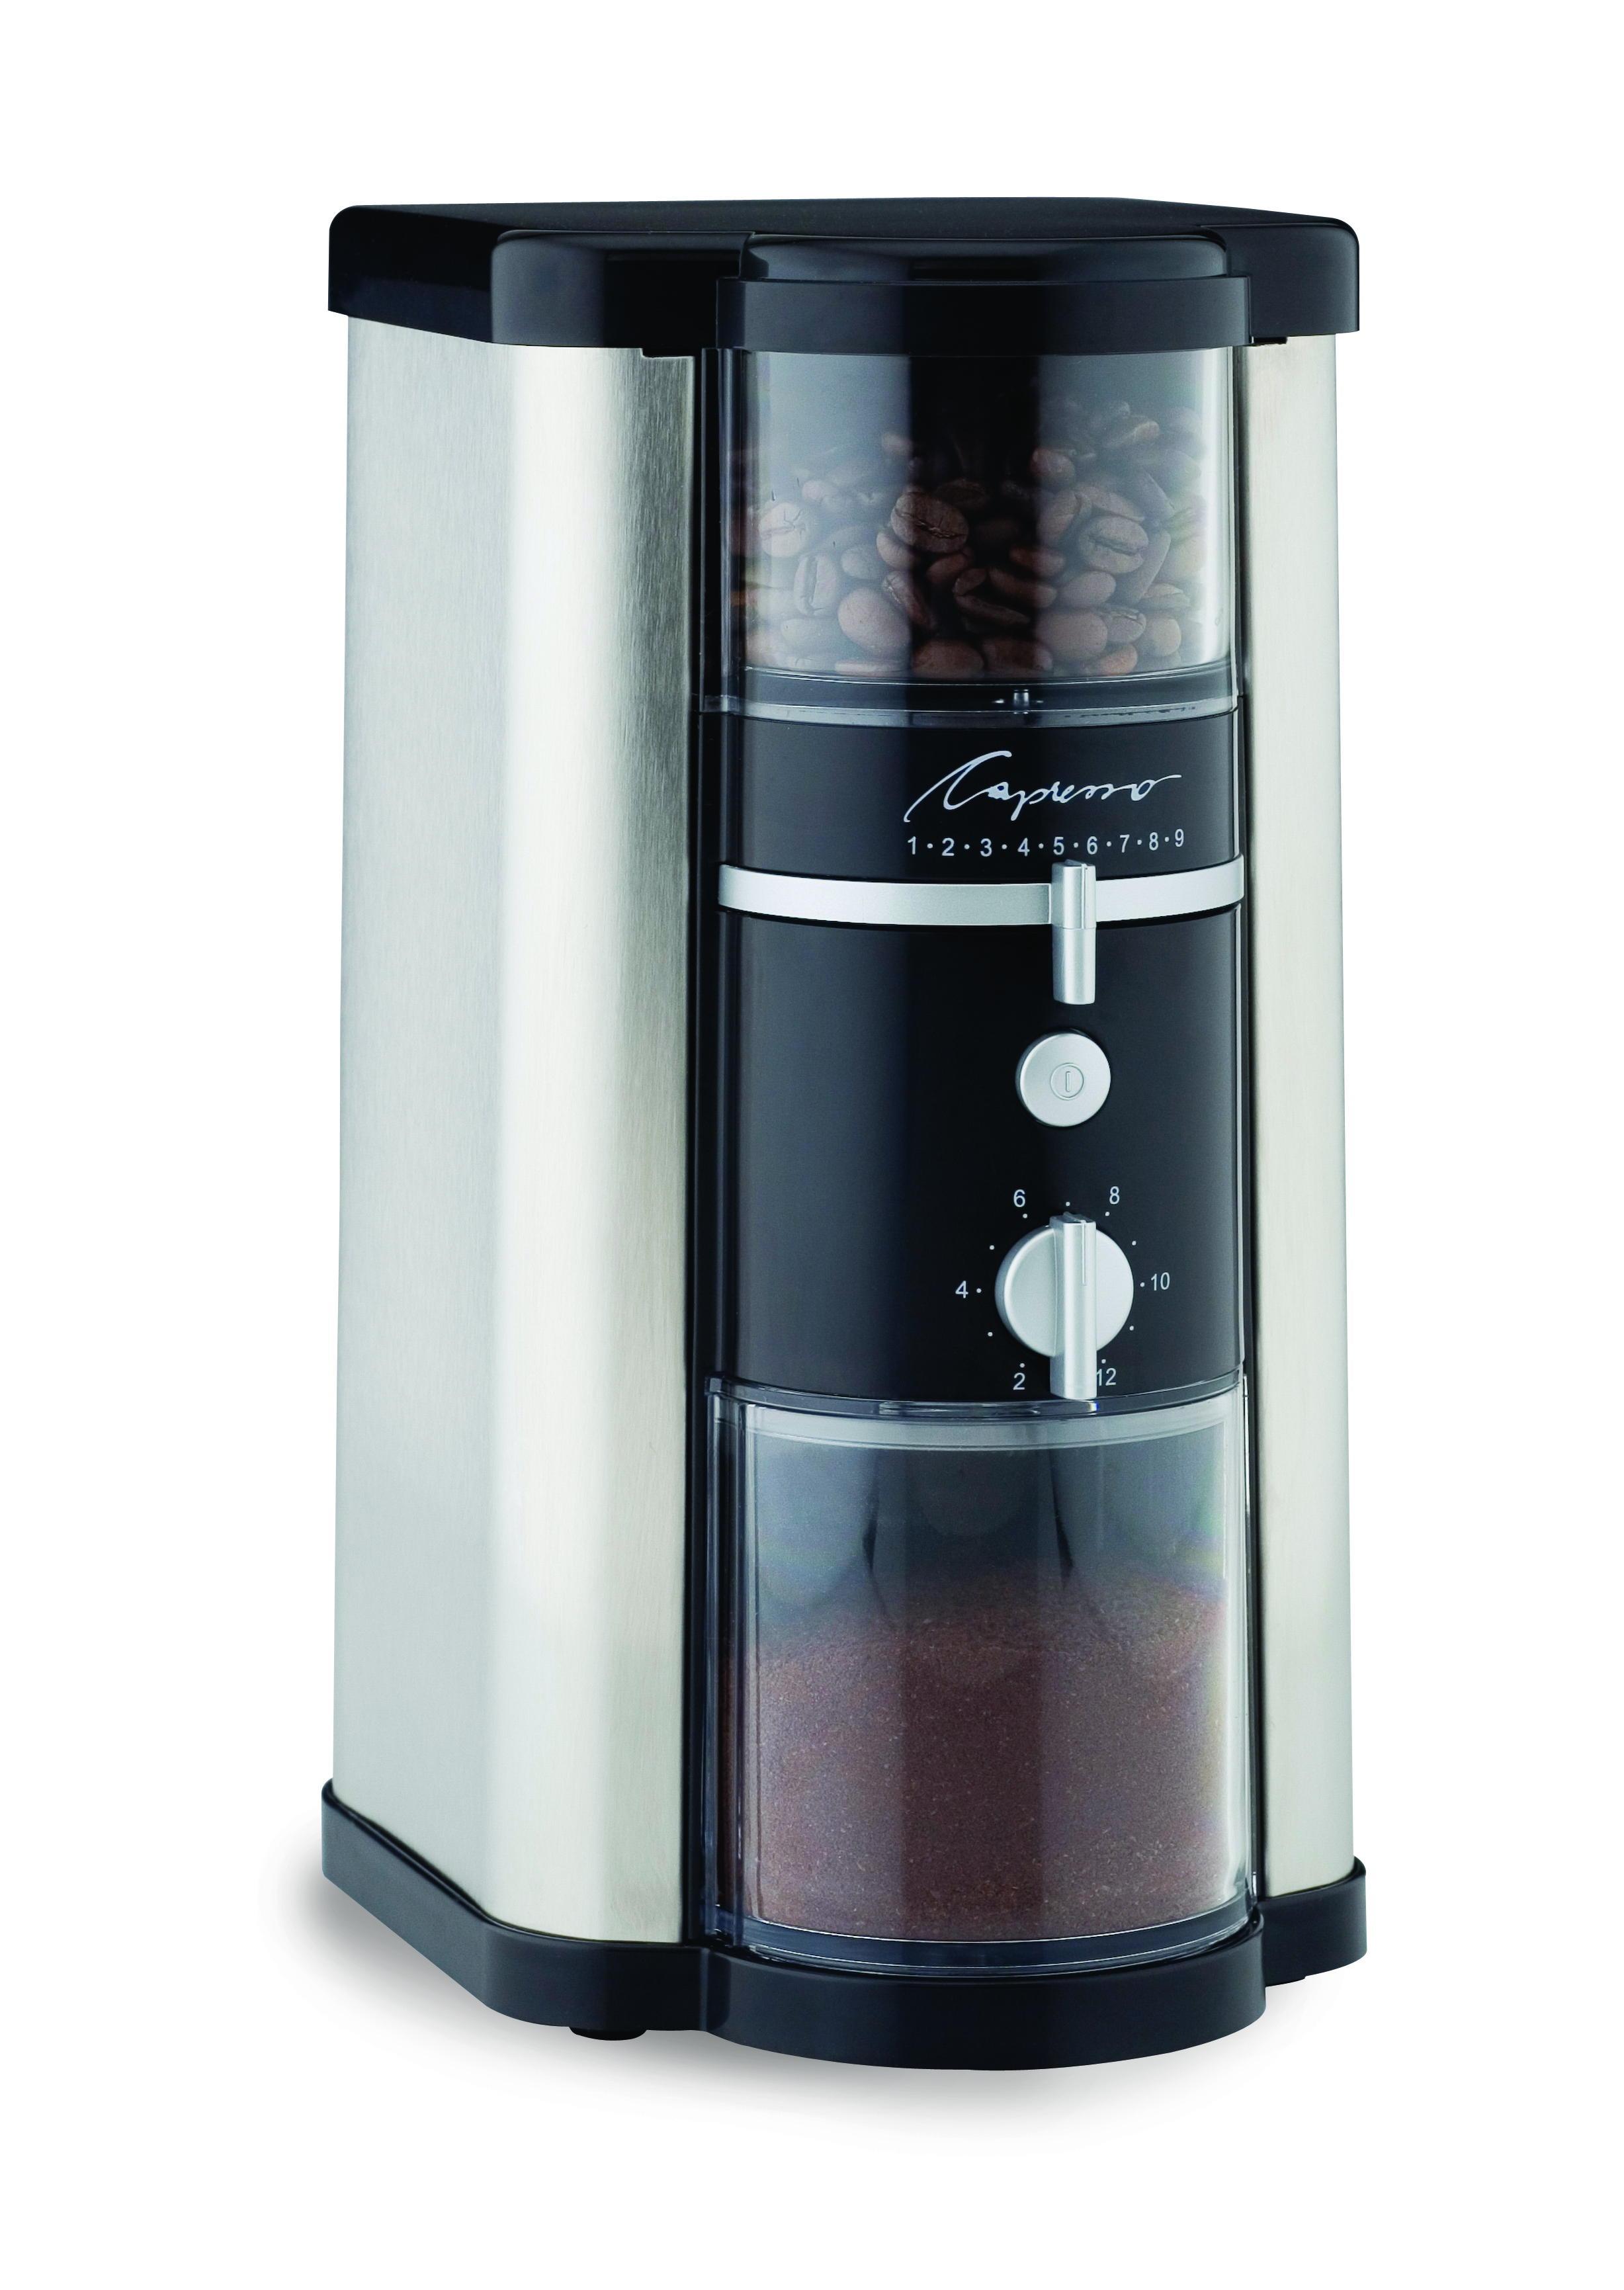 Capresso Stainless Steel Disk Type Burr Coffee Grinder